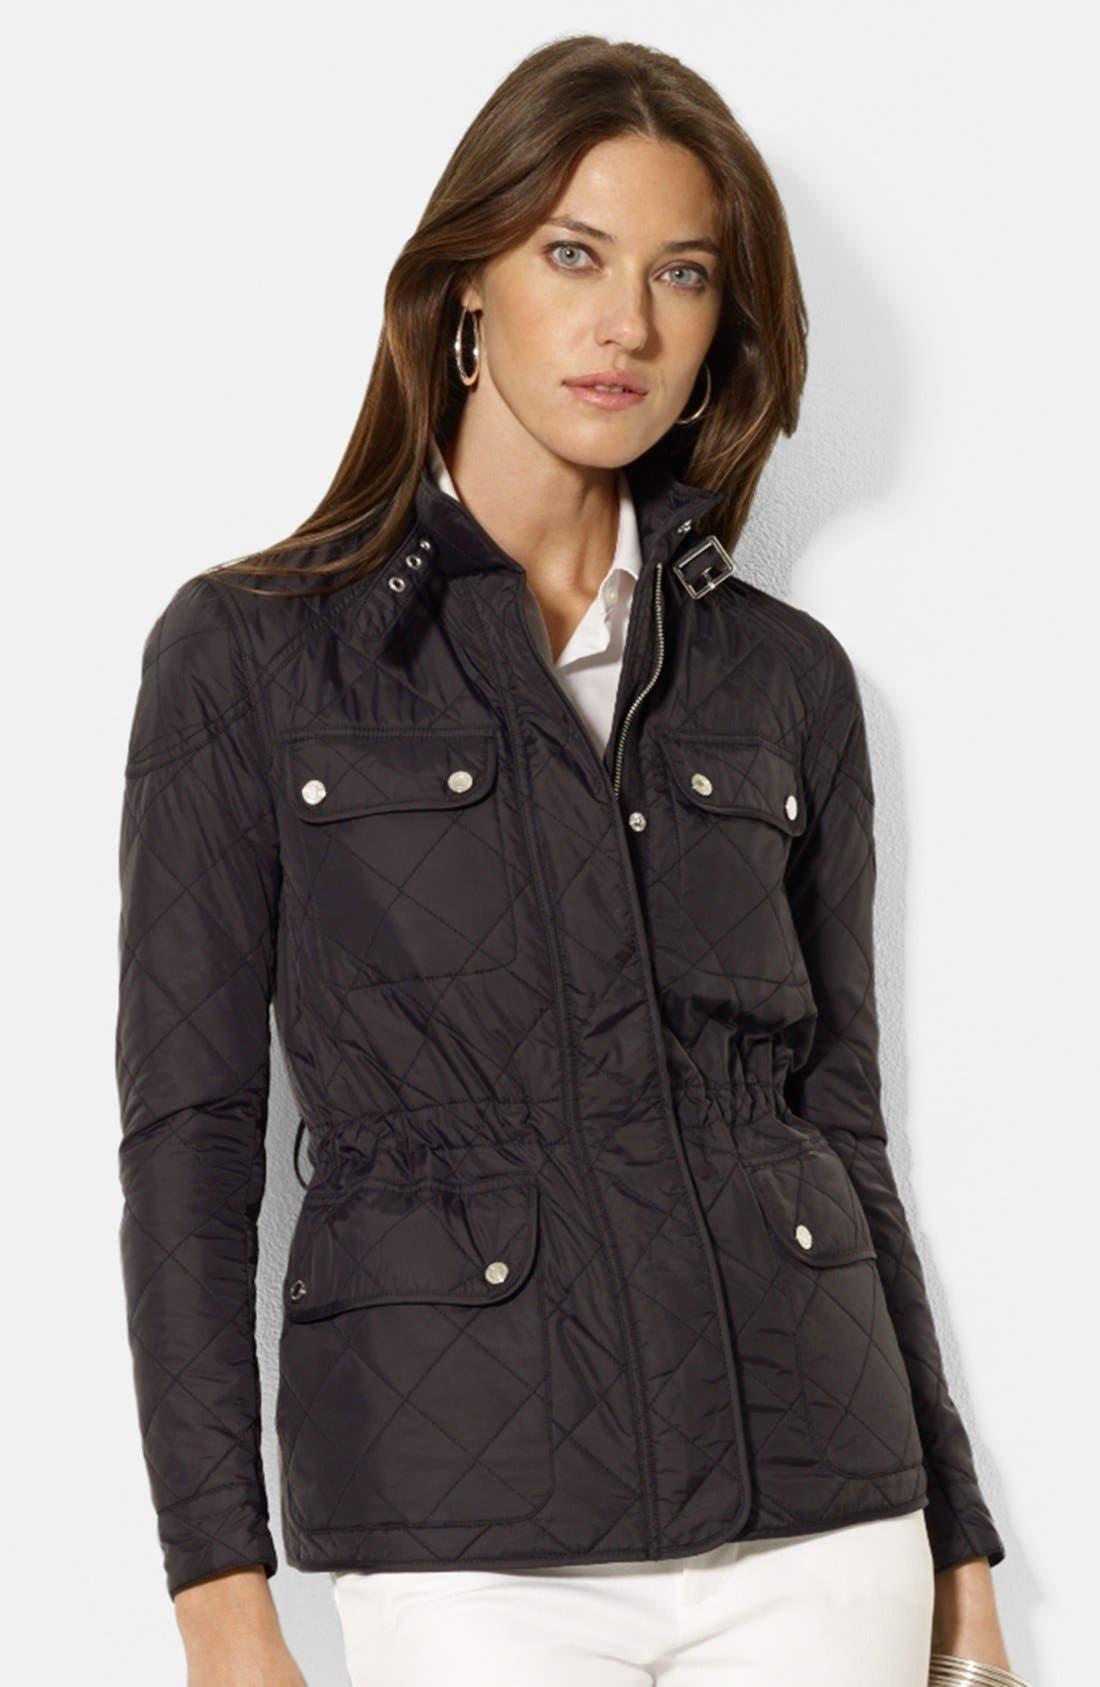 Alternate Image 1 Selected - Lauren Ralph Lauren Four-Pocket Belted Quilted Jacket (Regular & Petite)